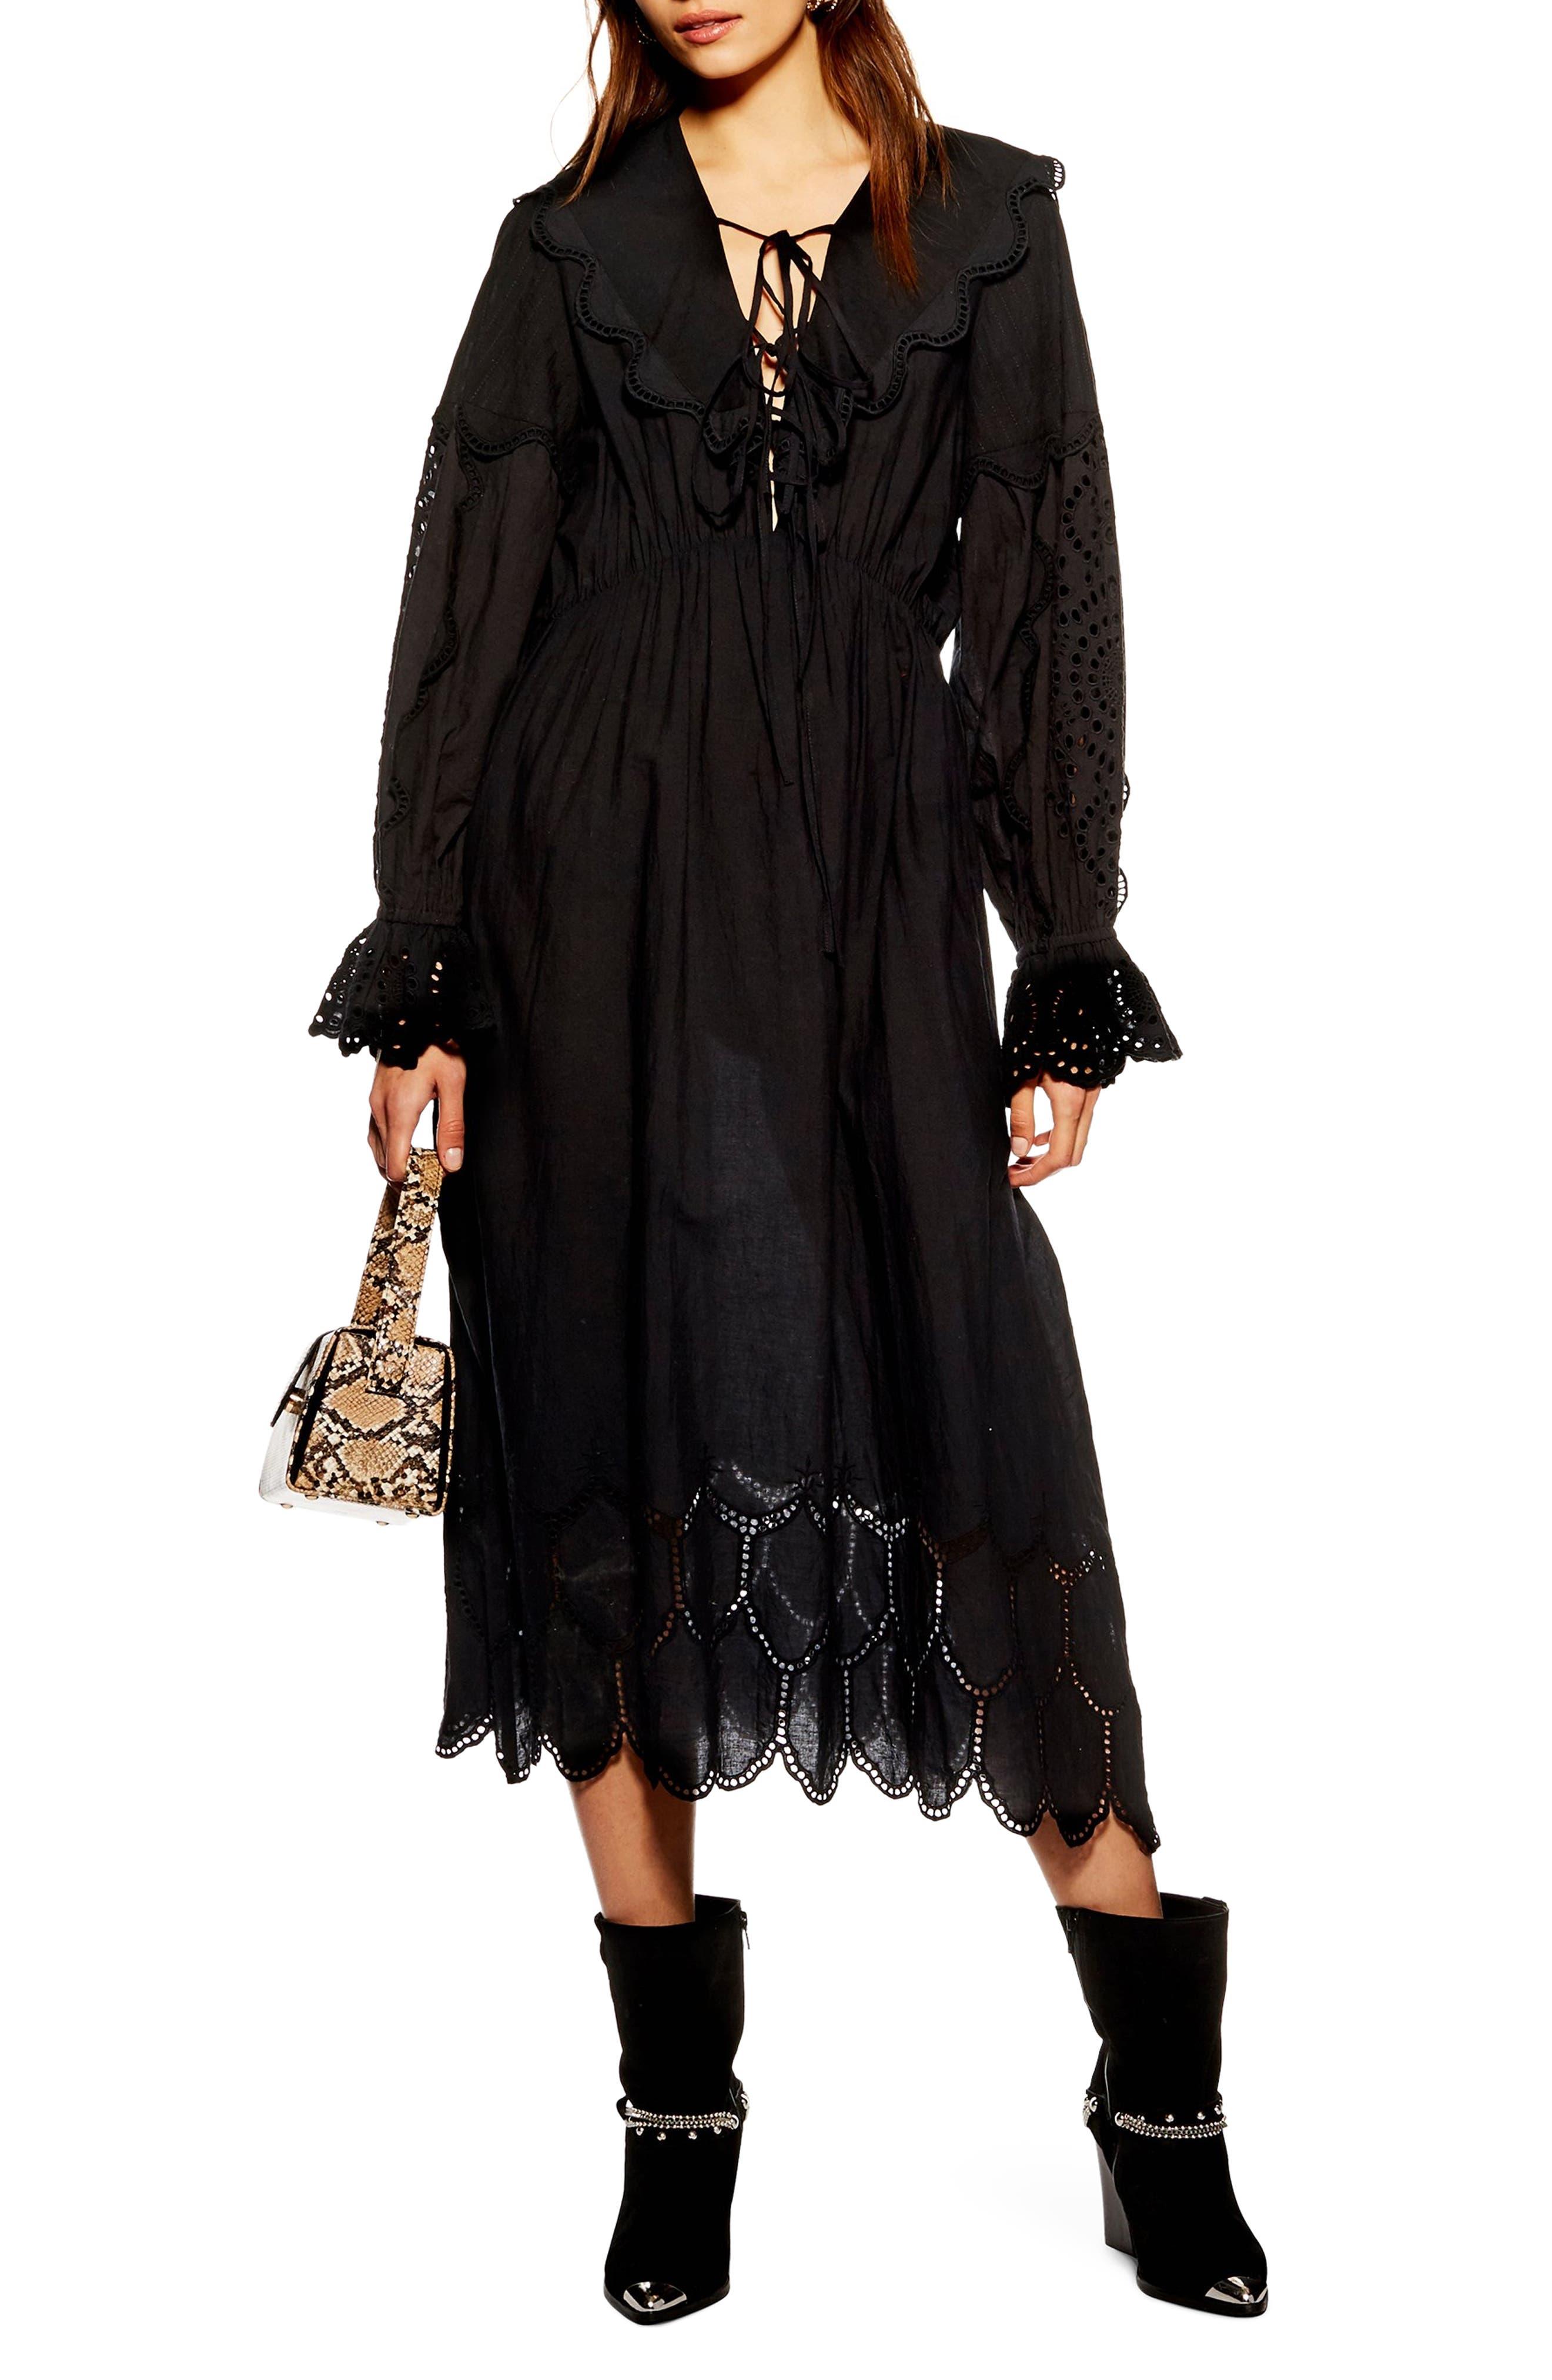 Topshop Broderie Midi Dress, US (fits like 6-8) - Black